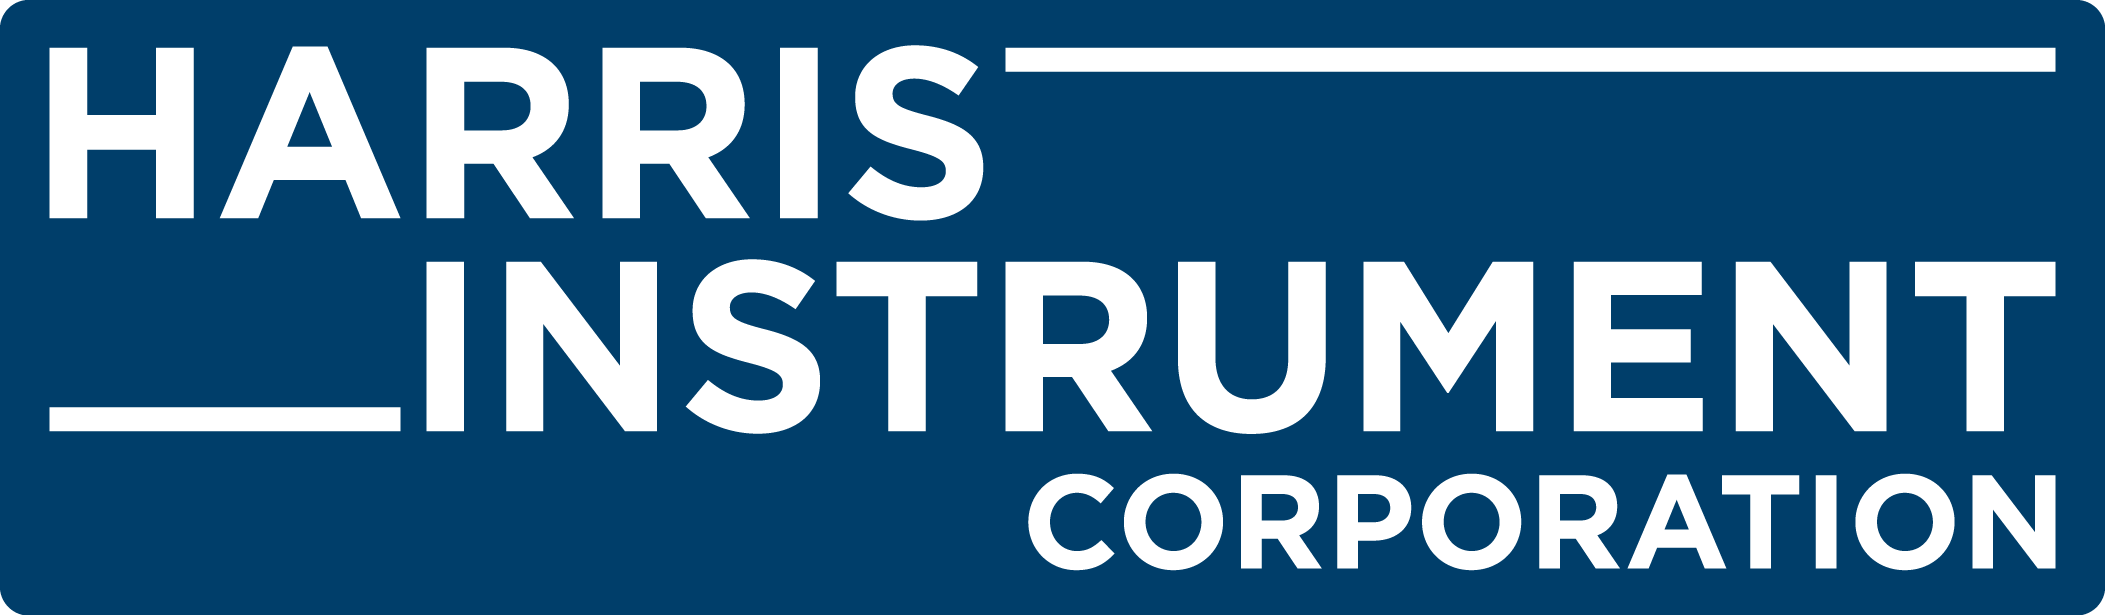 Harris Instrument Corp.